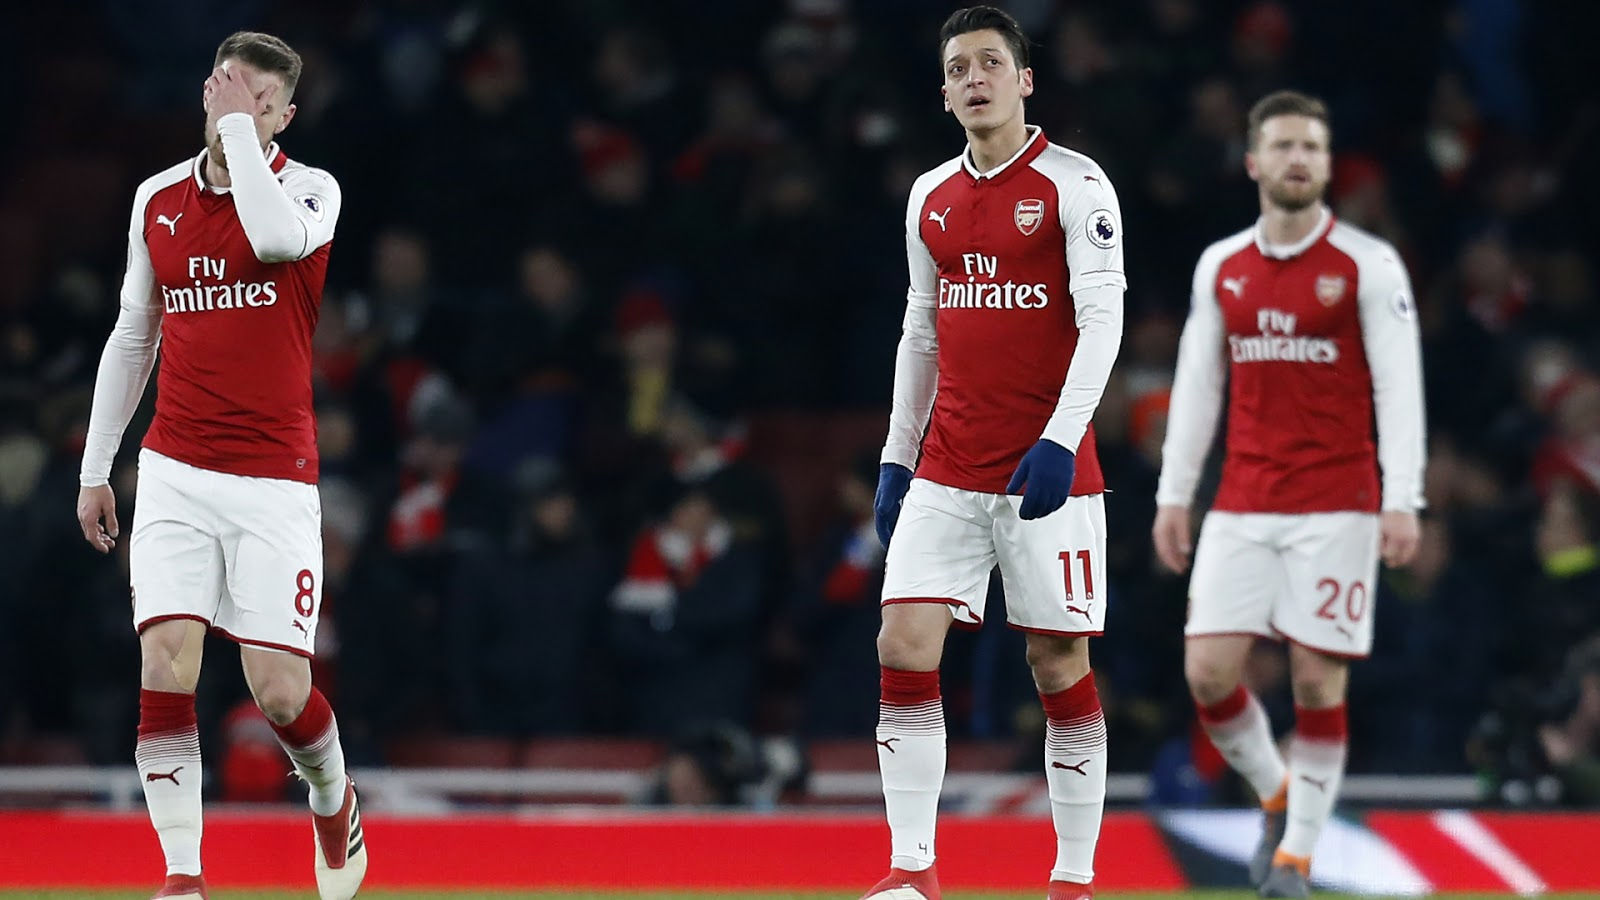 RIP-Arsene-Wenger-cua-Arsenal-1996-2018-1